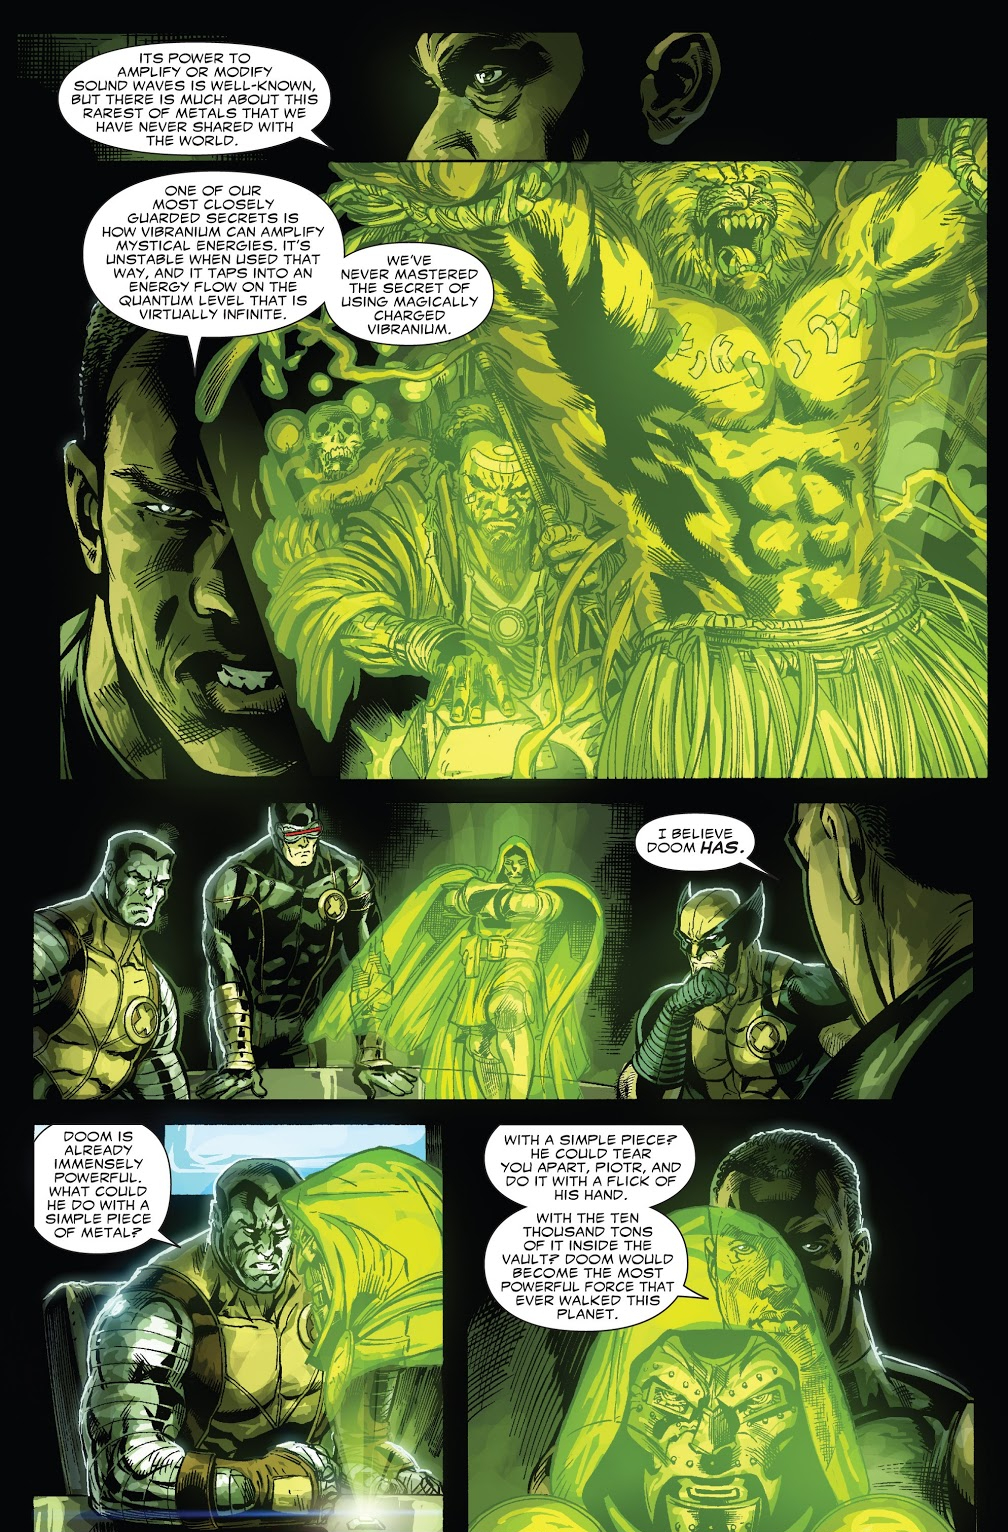 In 'Doomwar' (2010) #1, T'Challa speaks about Vibranium's mystical properties.